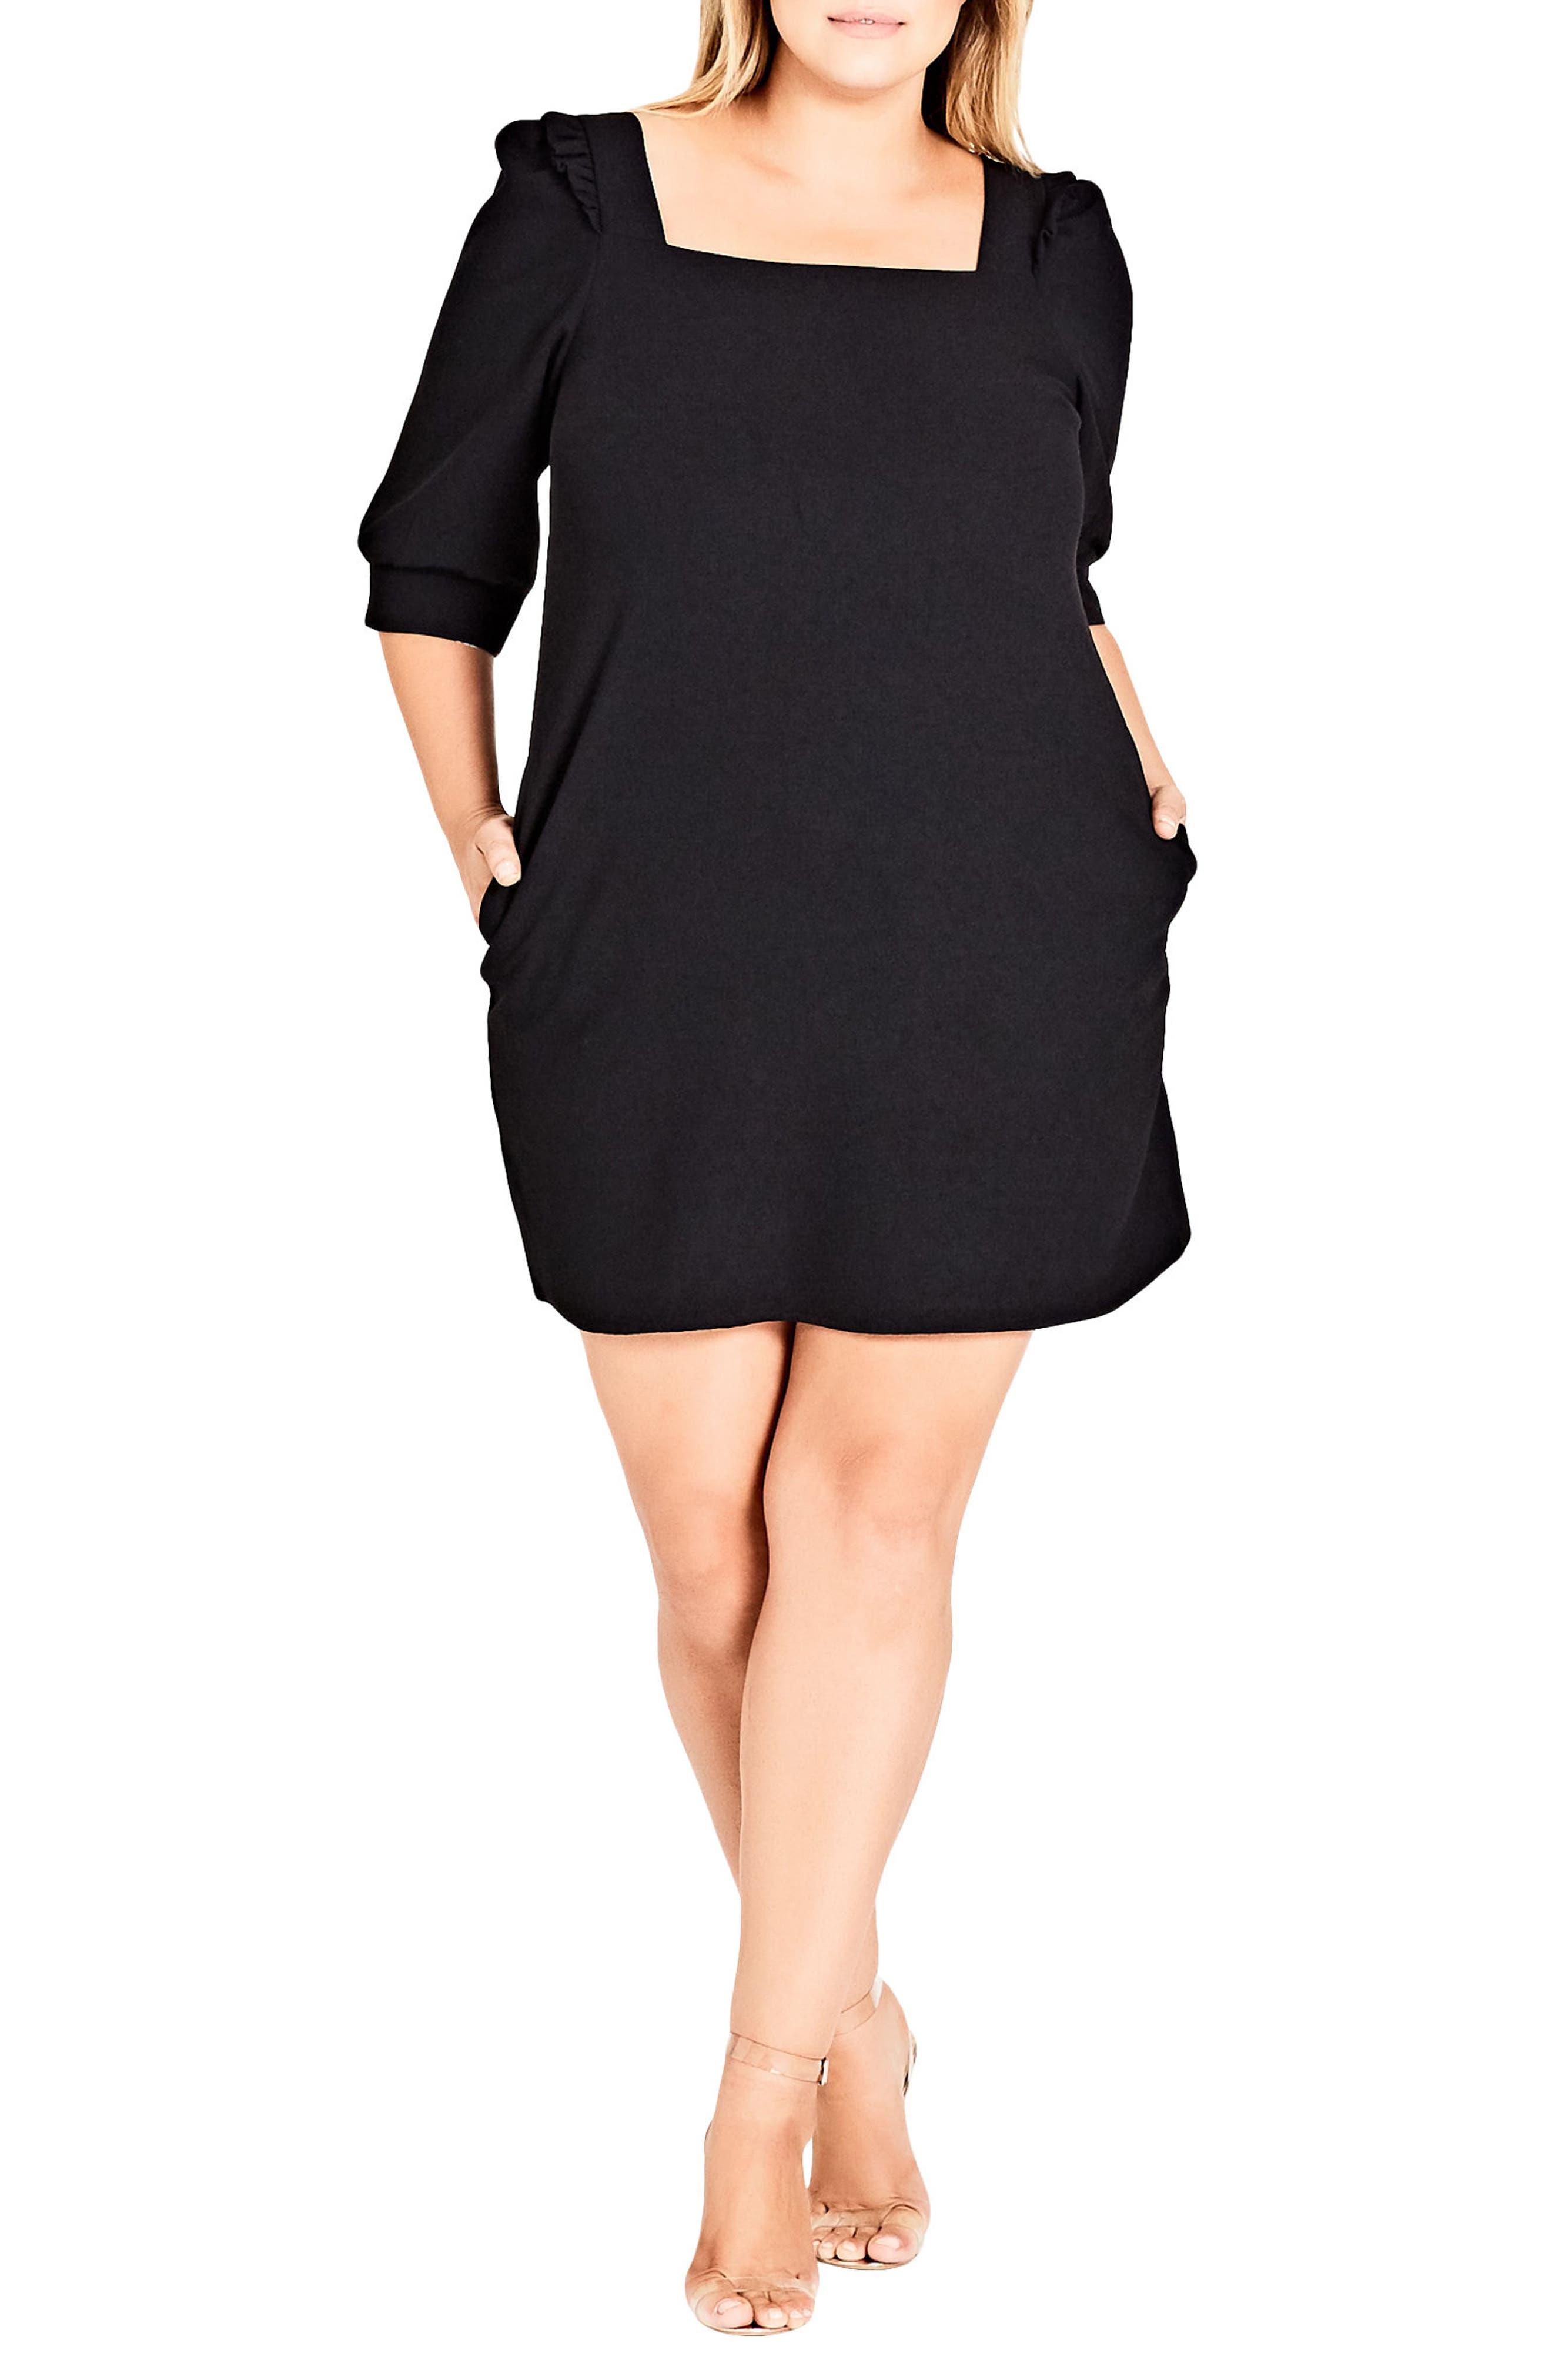 Darling Square Neck Dress,                         Main,                         color, BLACK